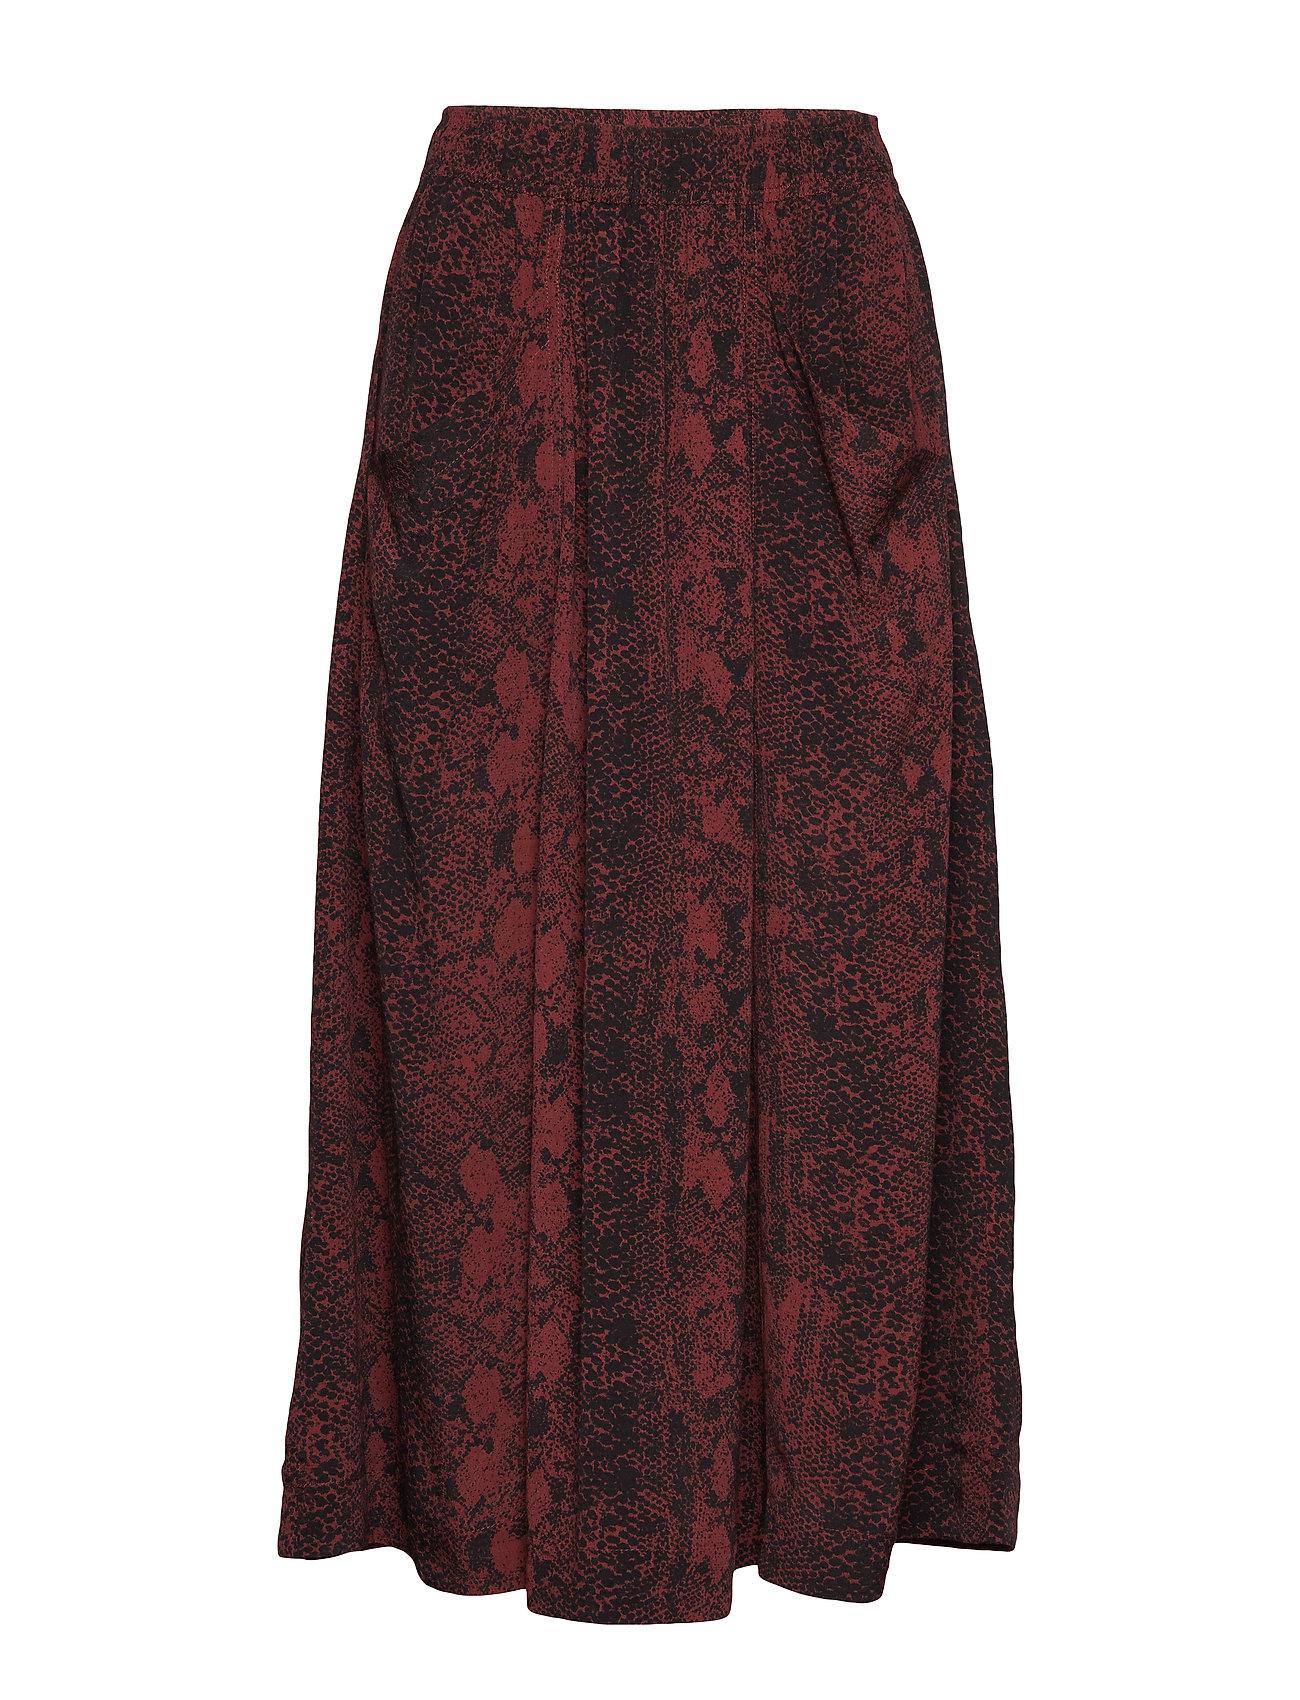 InWear KavitaIW Skirt - RUSSET BROWN SNAKE